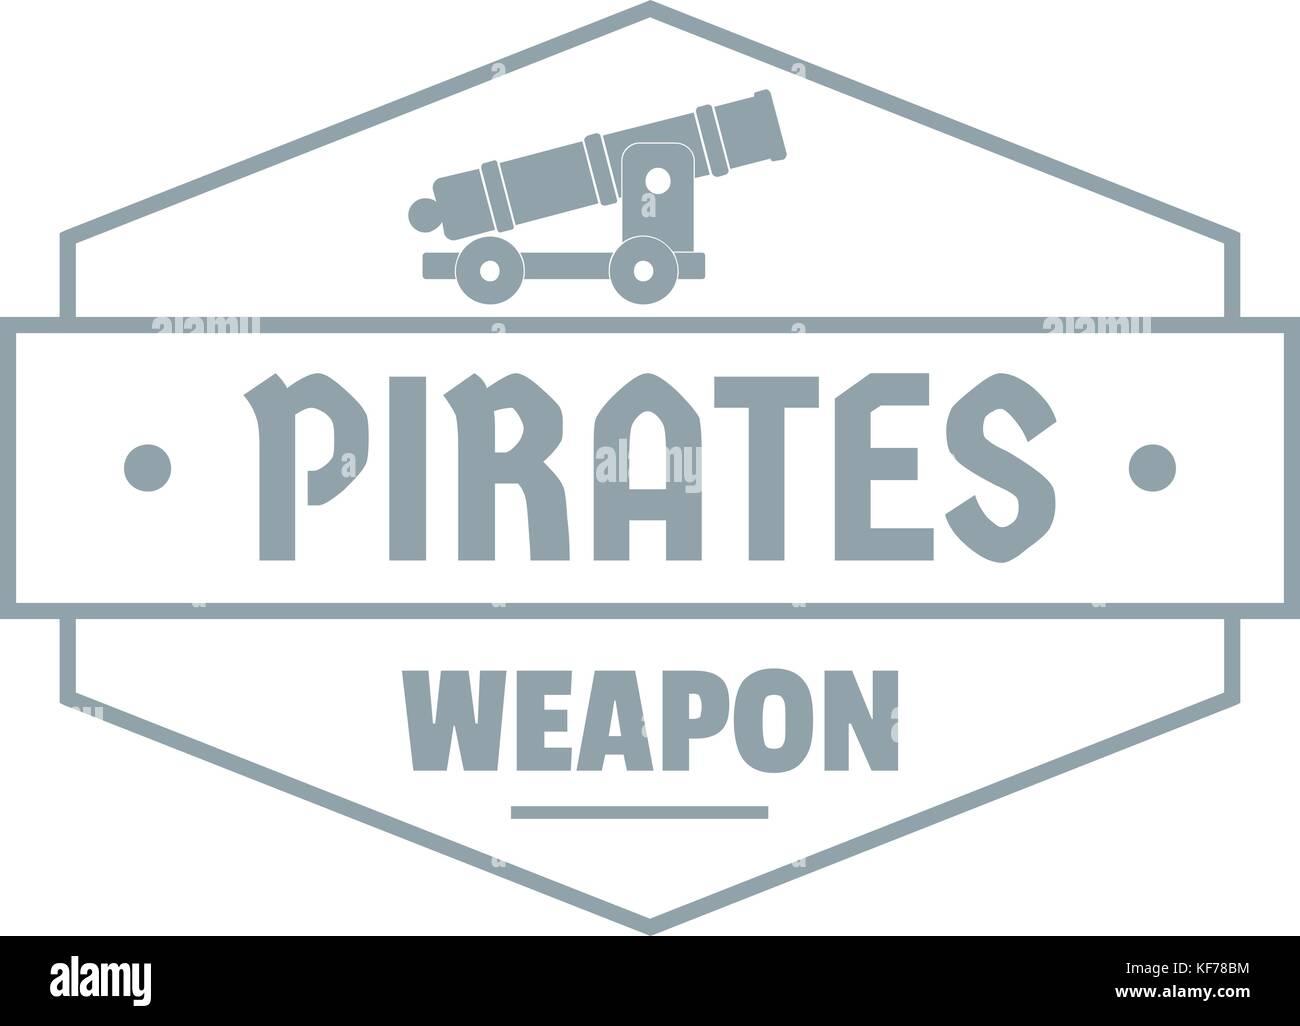 Piraten Kanone logo, einfachen grauen Stil Stockbild